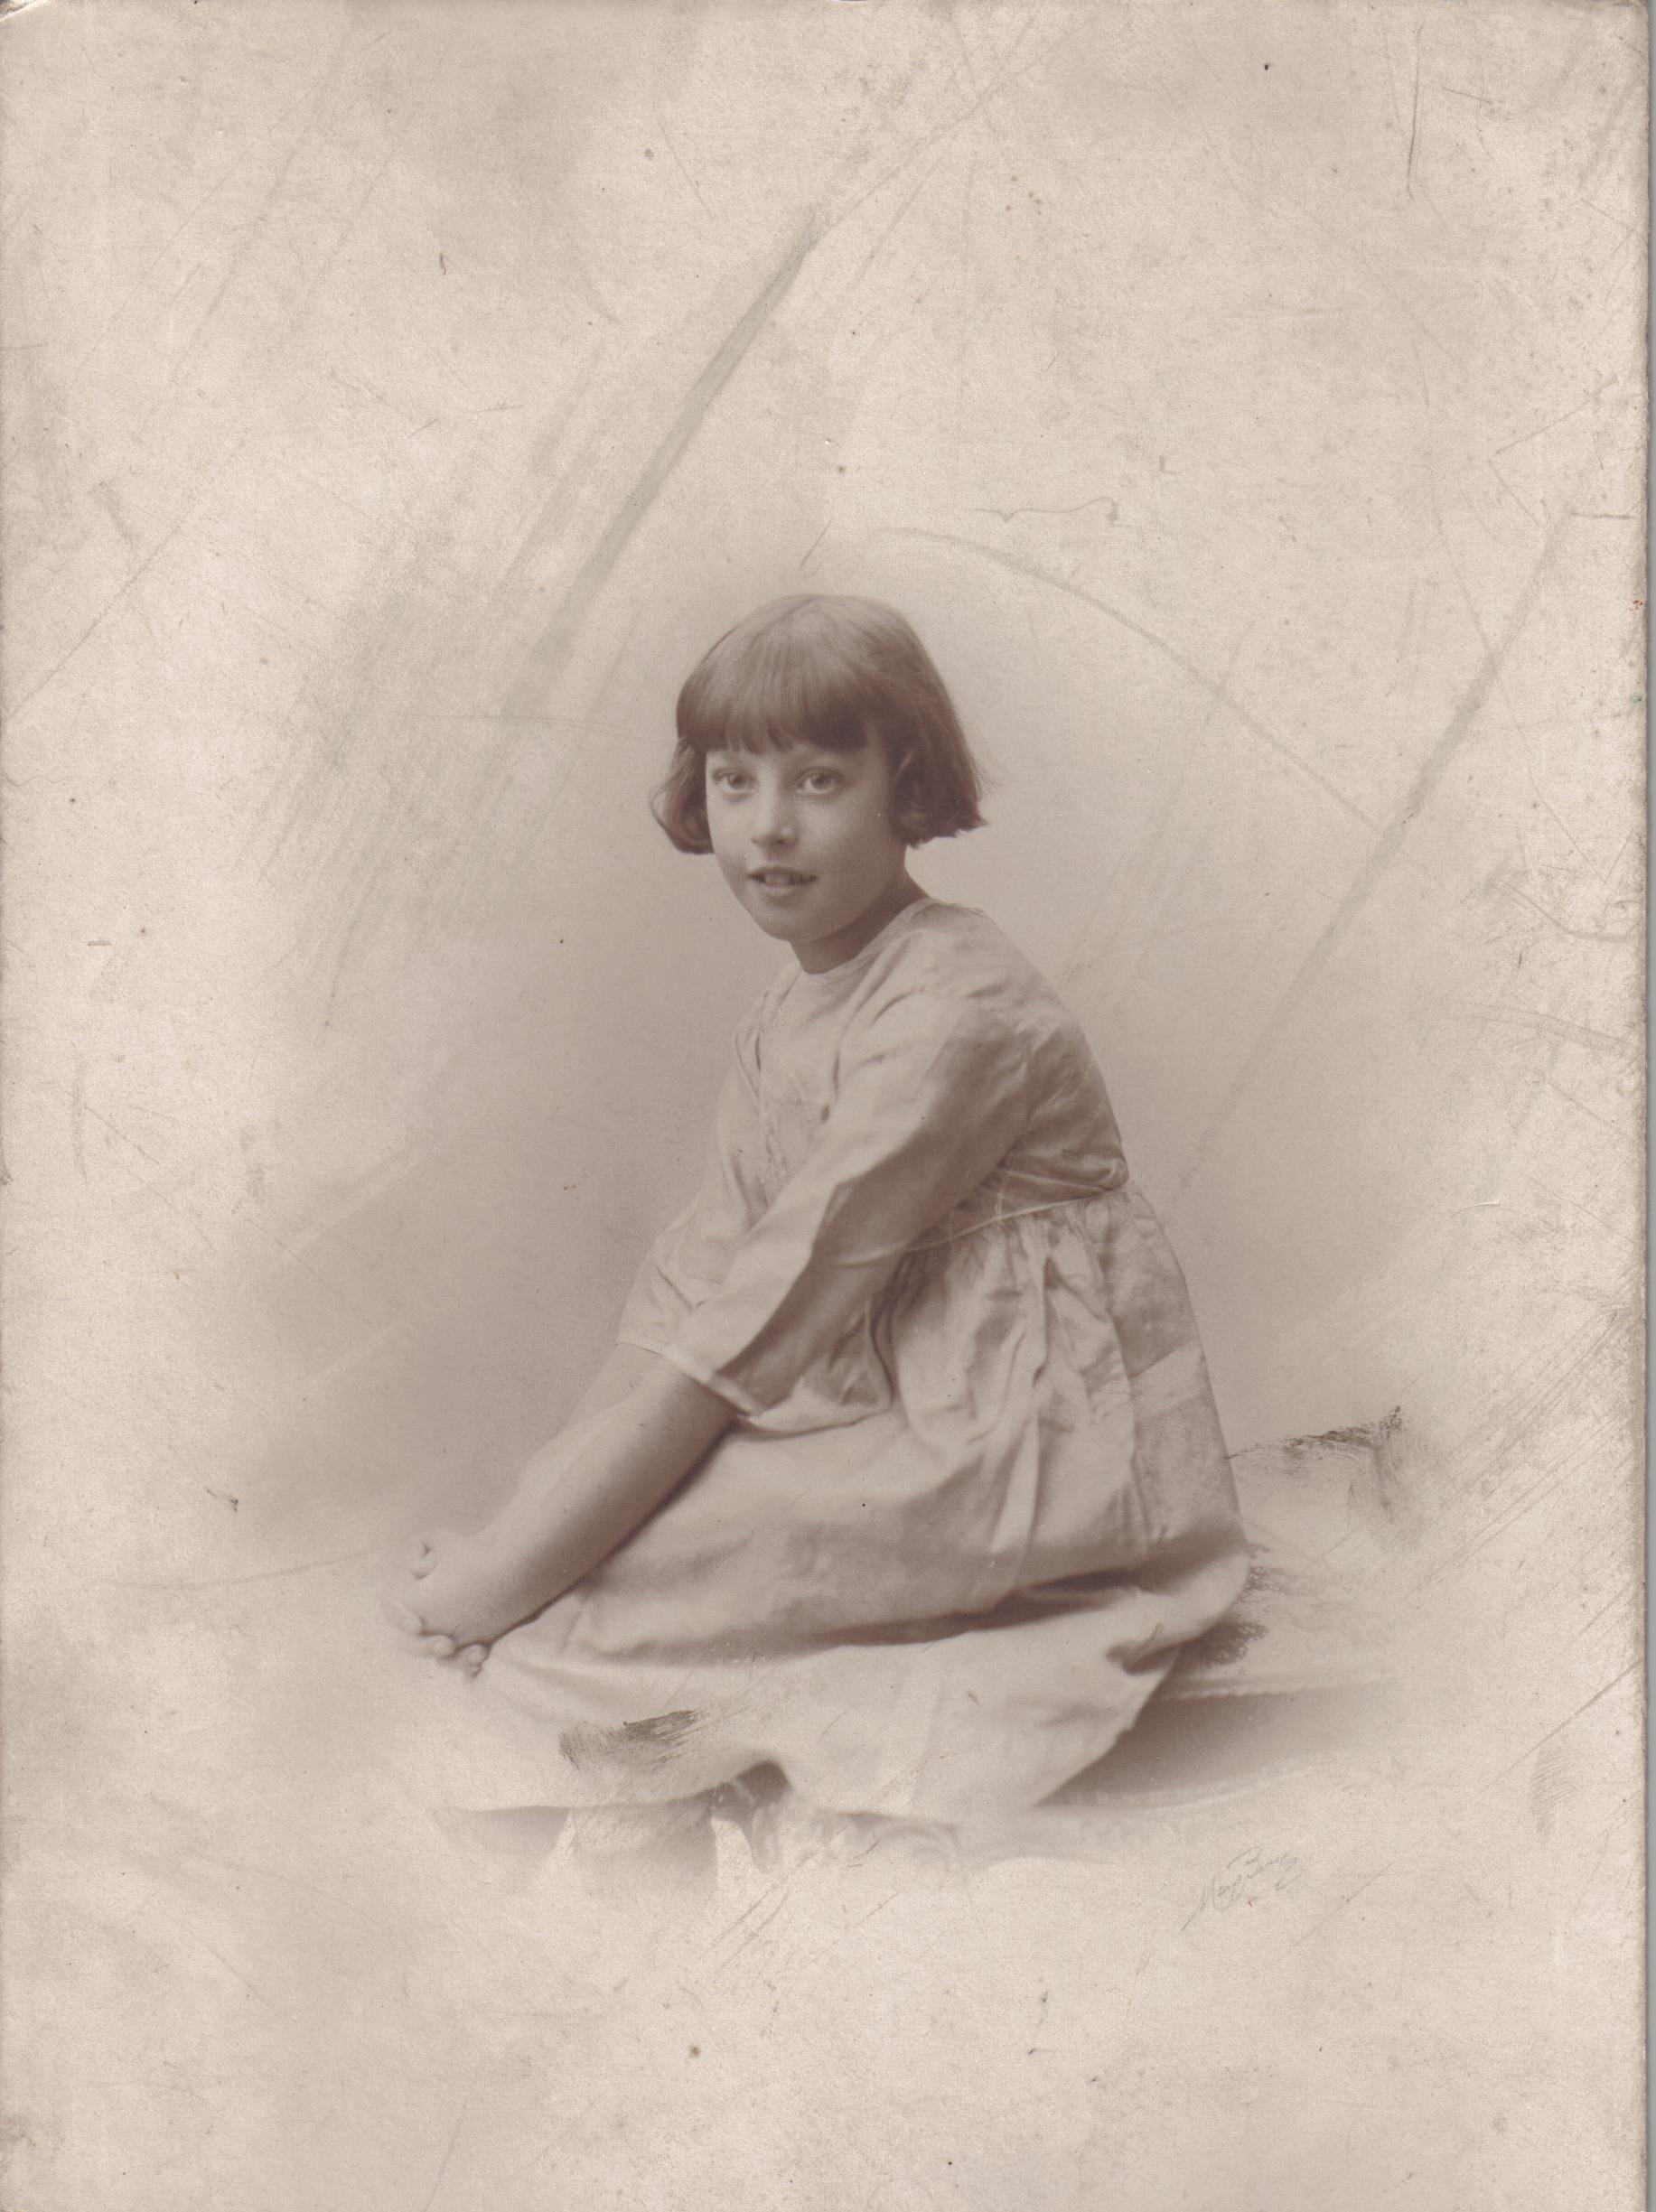 Janet Arber